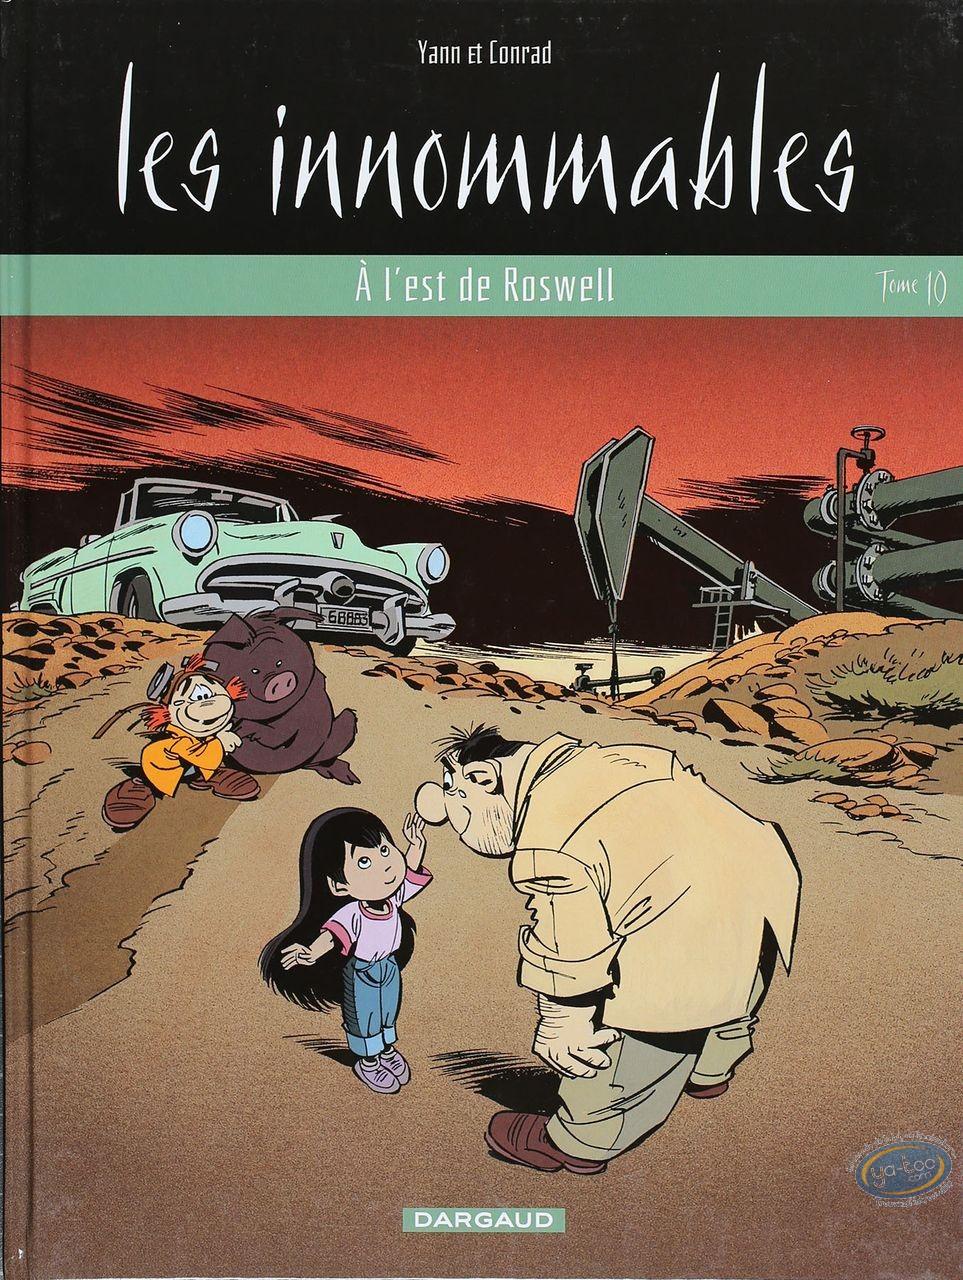 Listed European Comic Books, Innommables (Les) : A L'est de Roswell